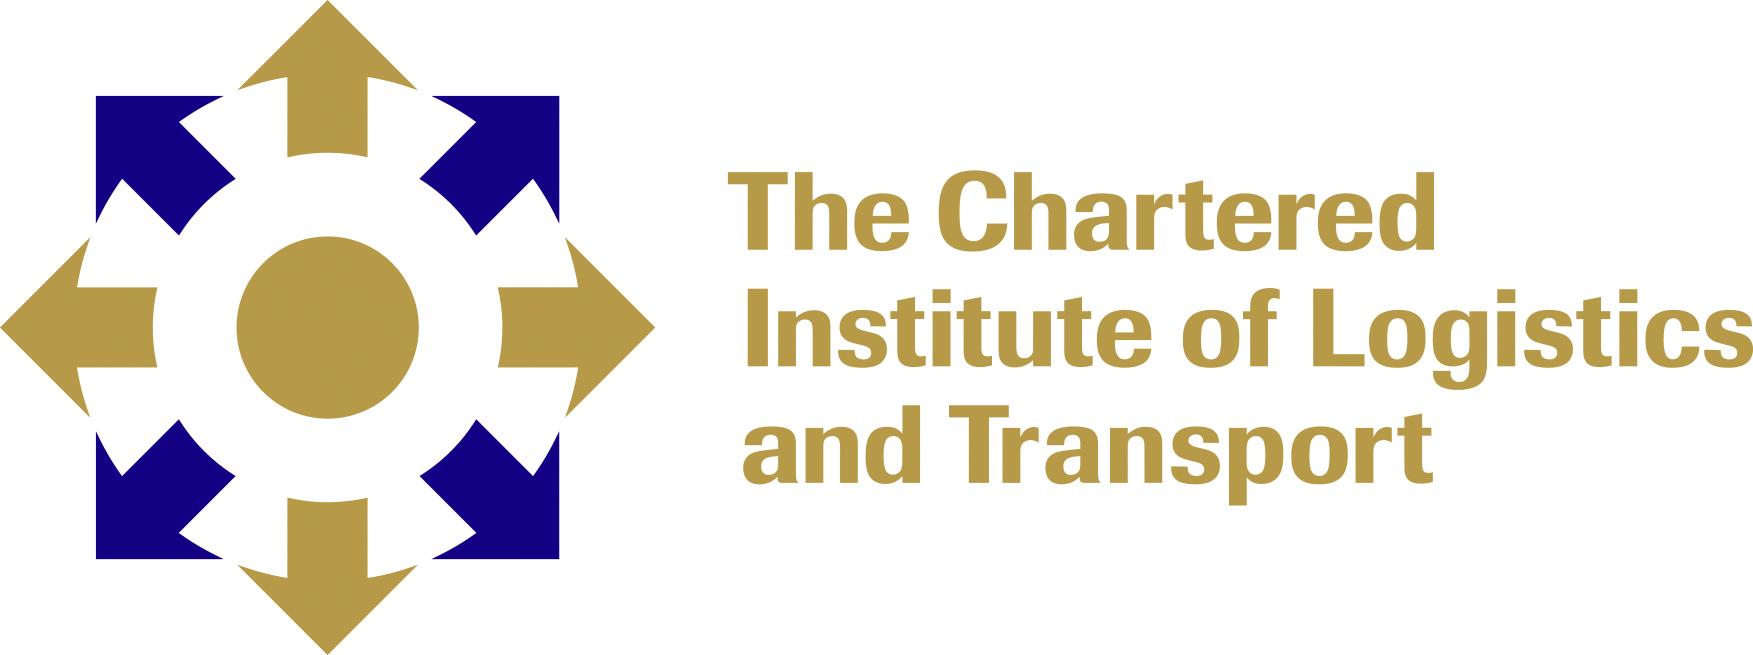 CILT Logo 4C P872-P269#1132.jpg